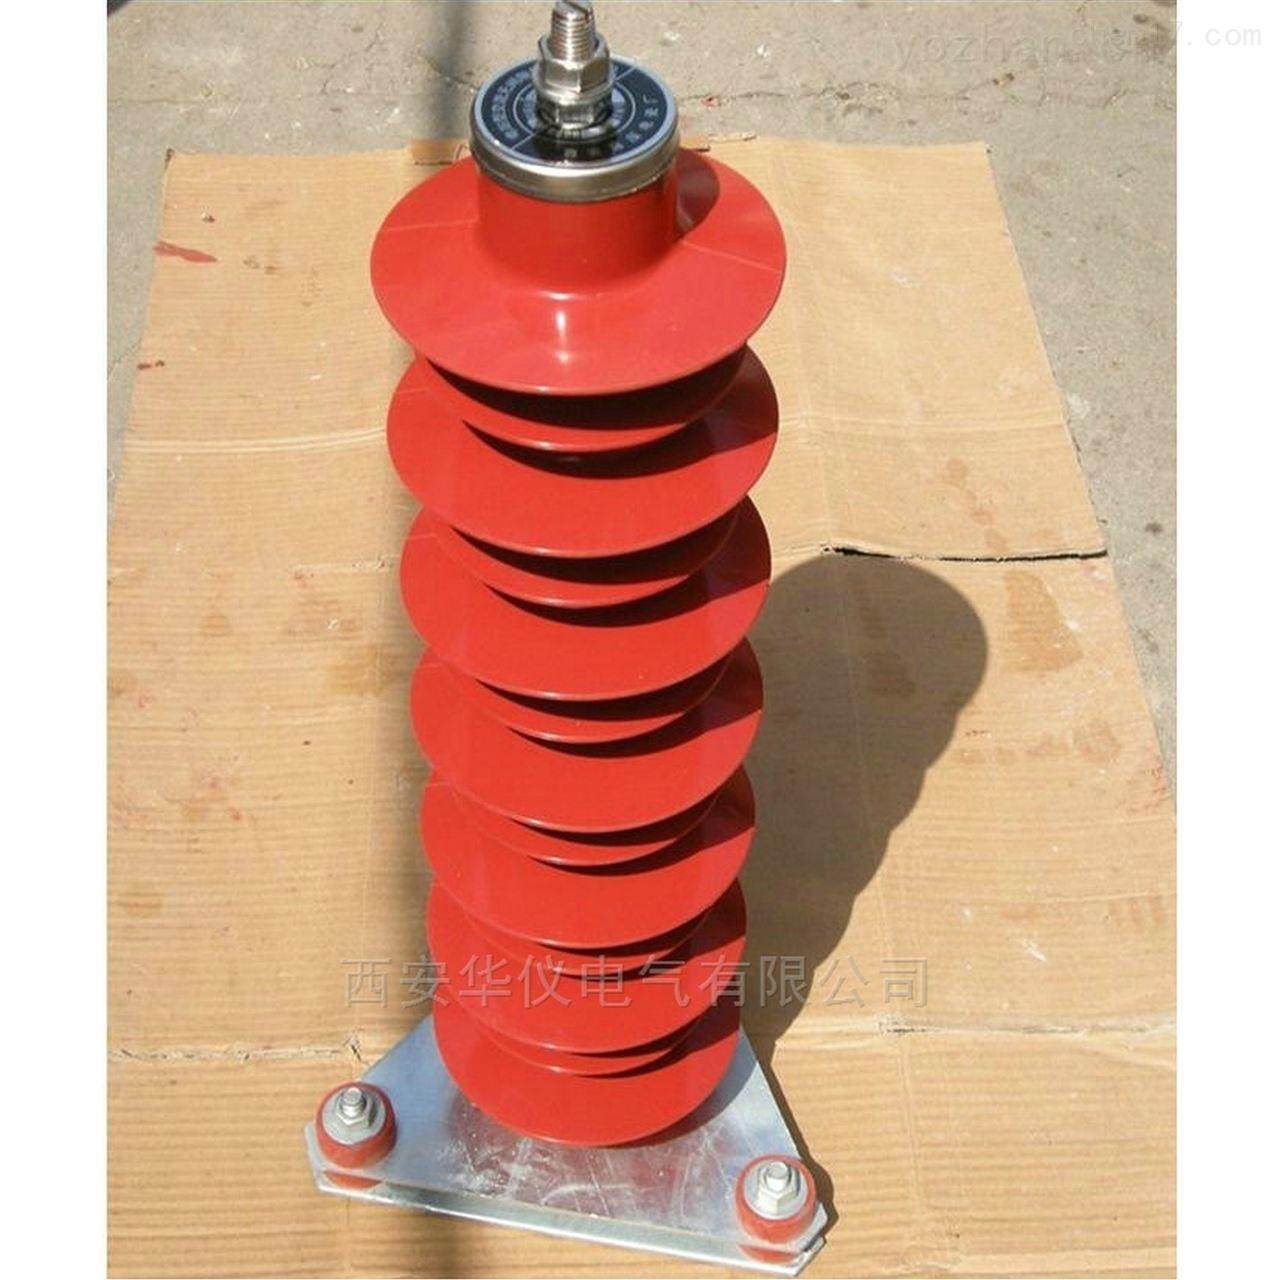 贵阳35kv避雷器HY5WS-51/134价格